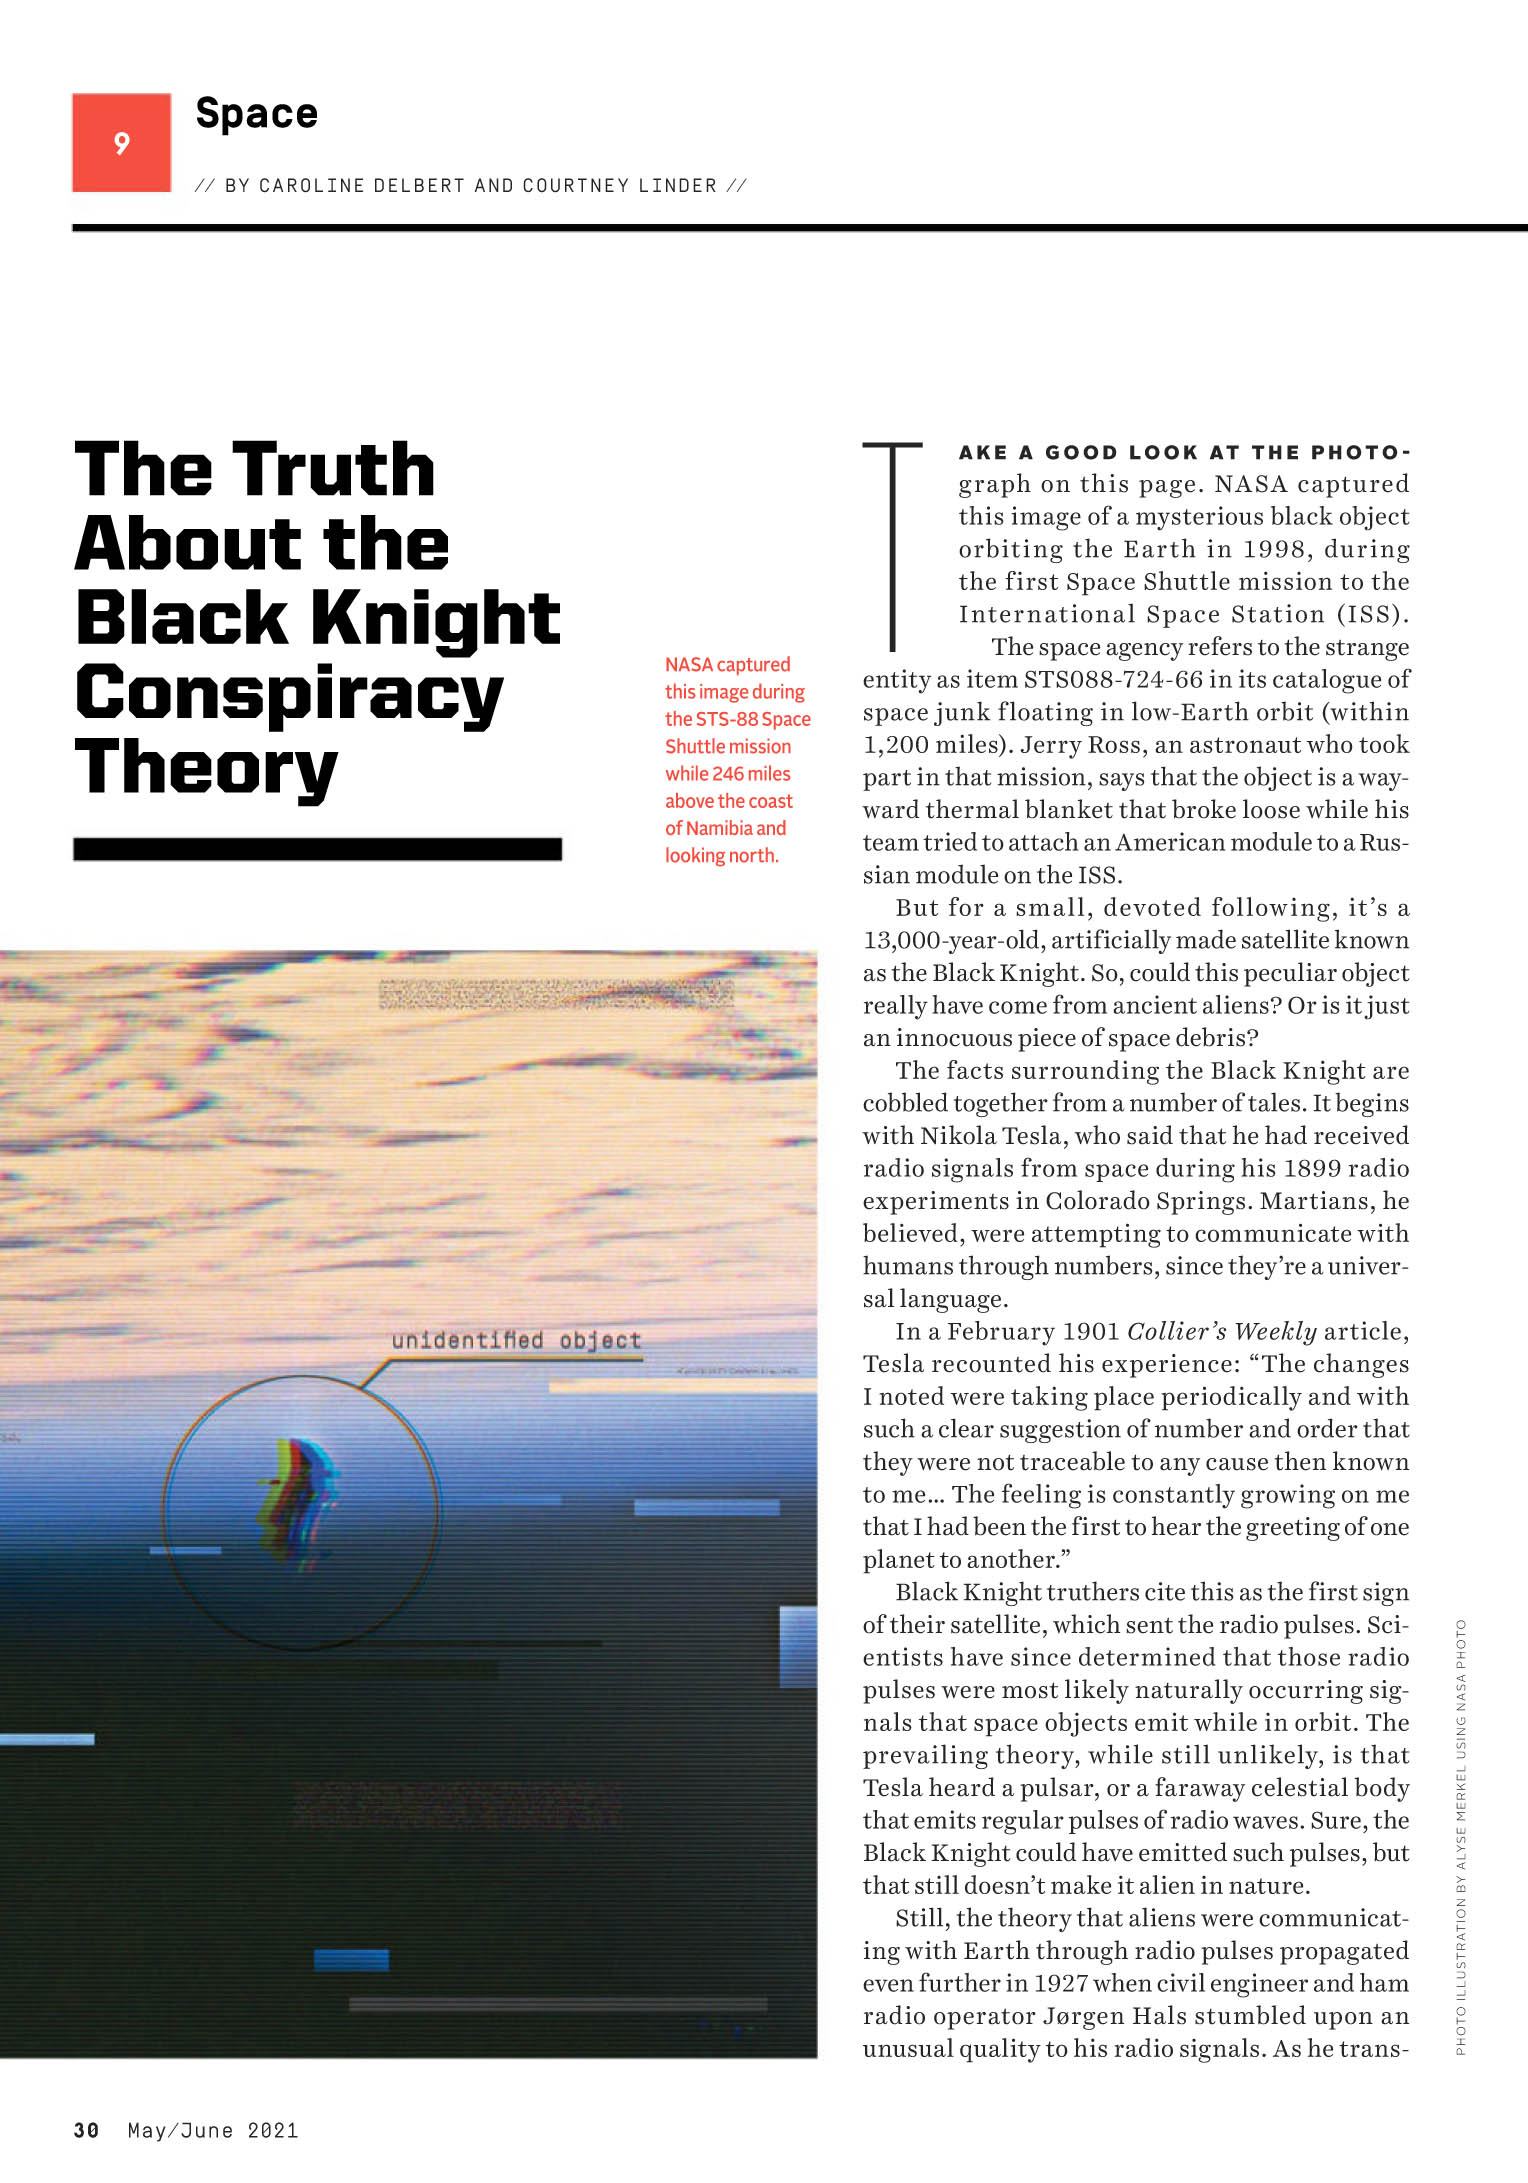 Popular Mechanics 2021-05-06 Black Knight 01.jpg